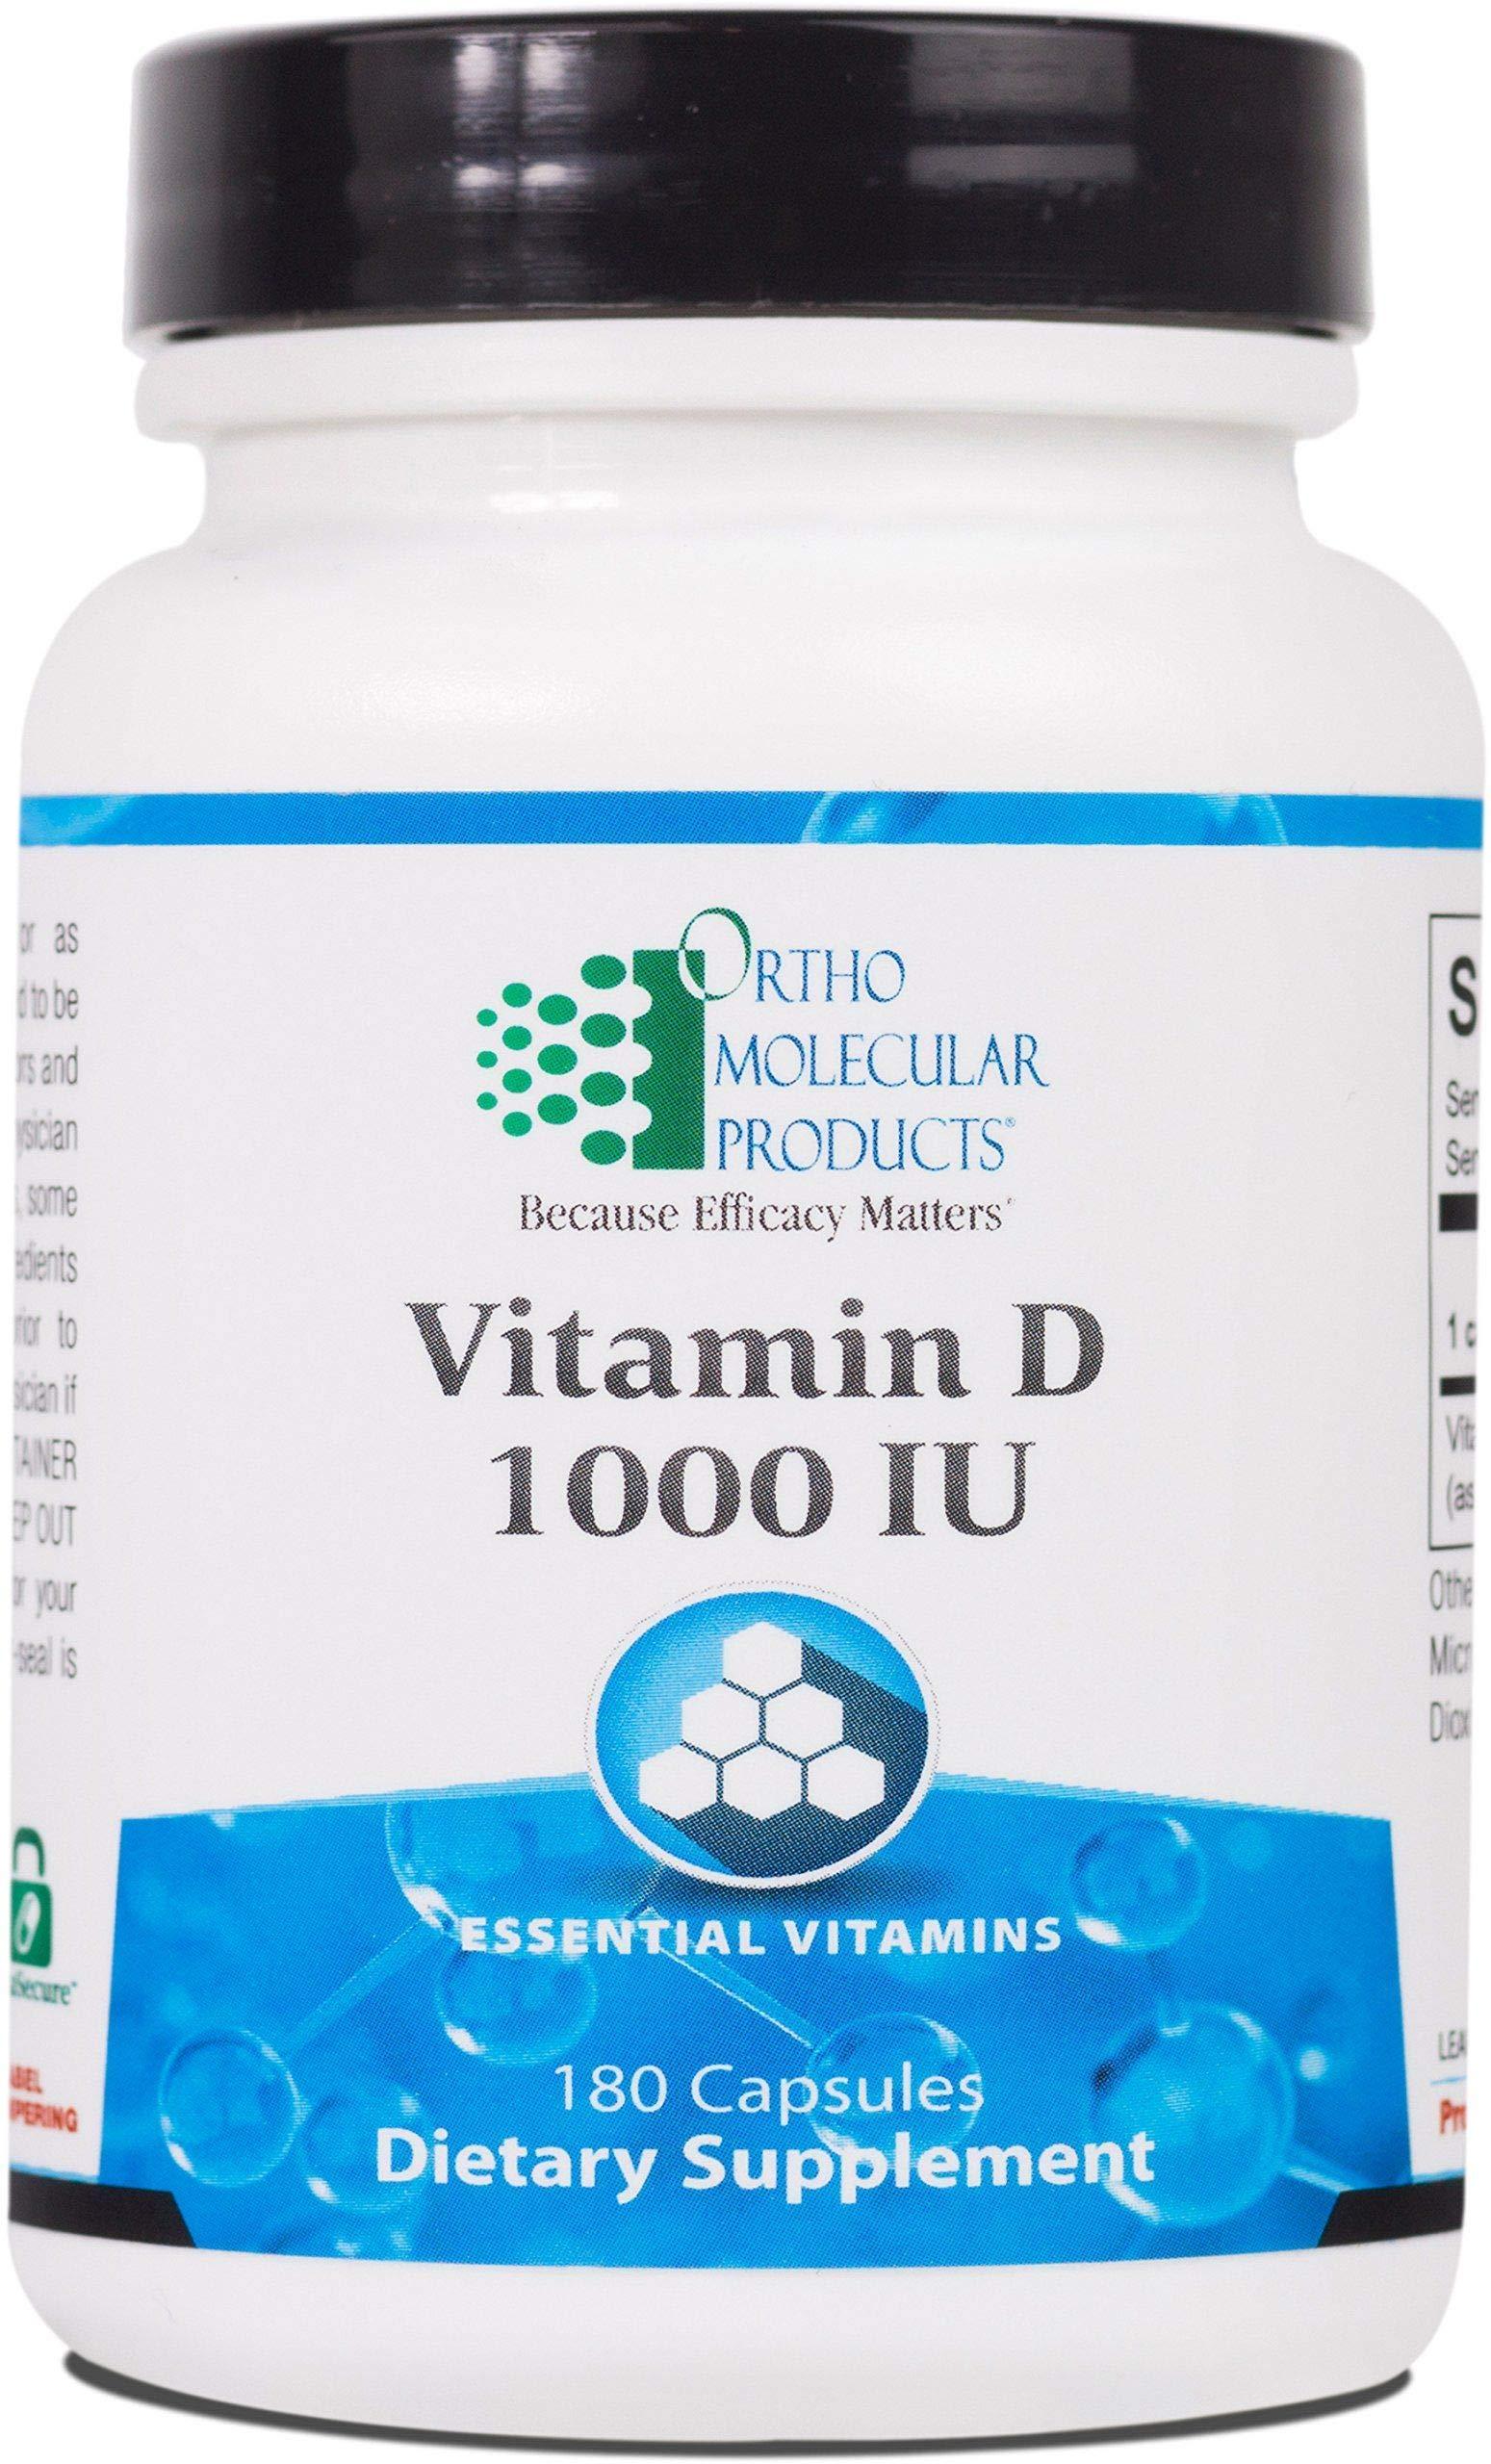 Ortho Molecular - Vitamin D 1,000 IU - 180 Capsules by Ortho Molecular